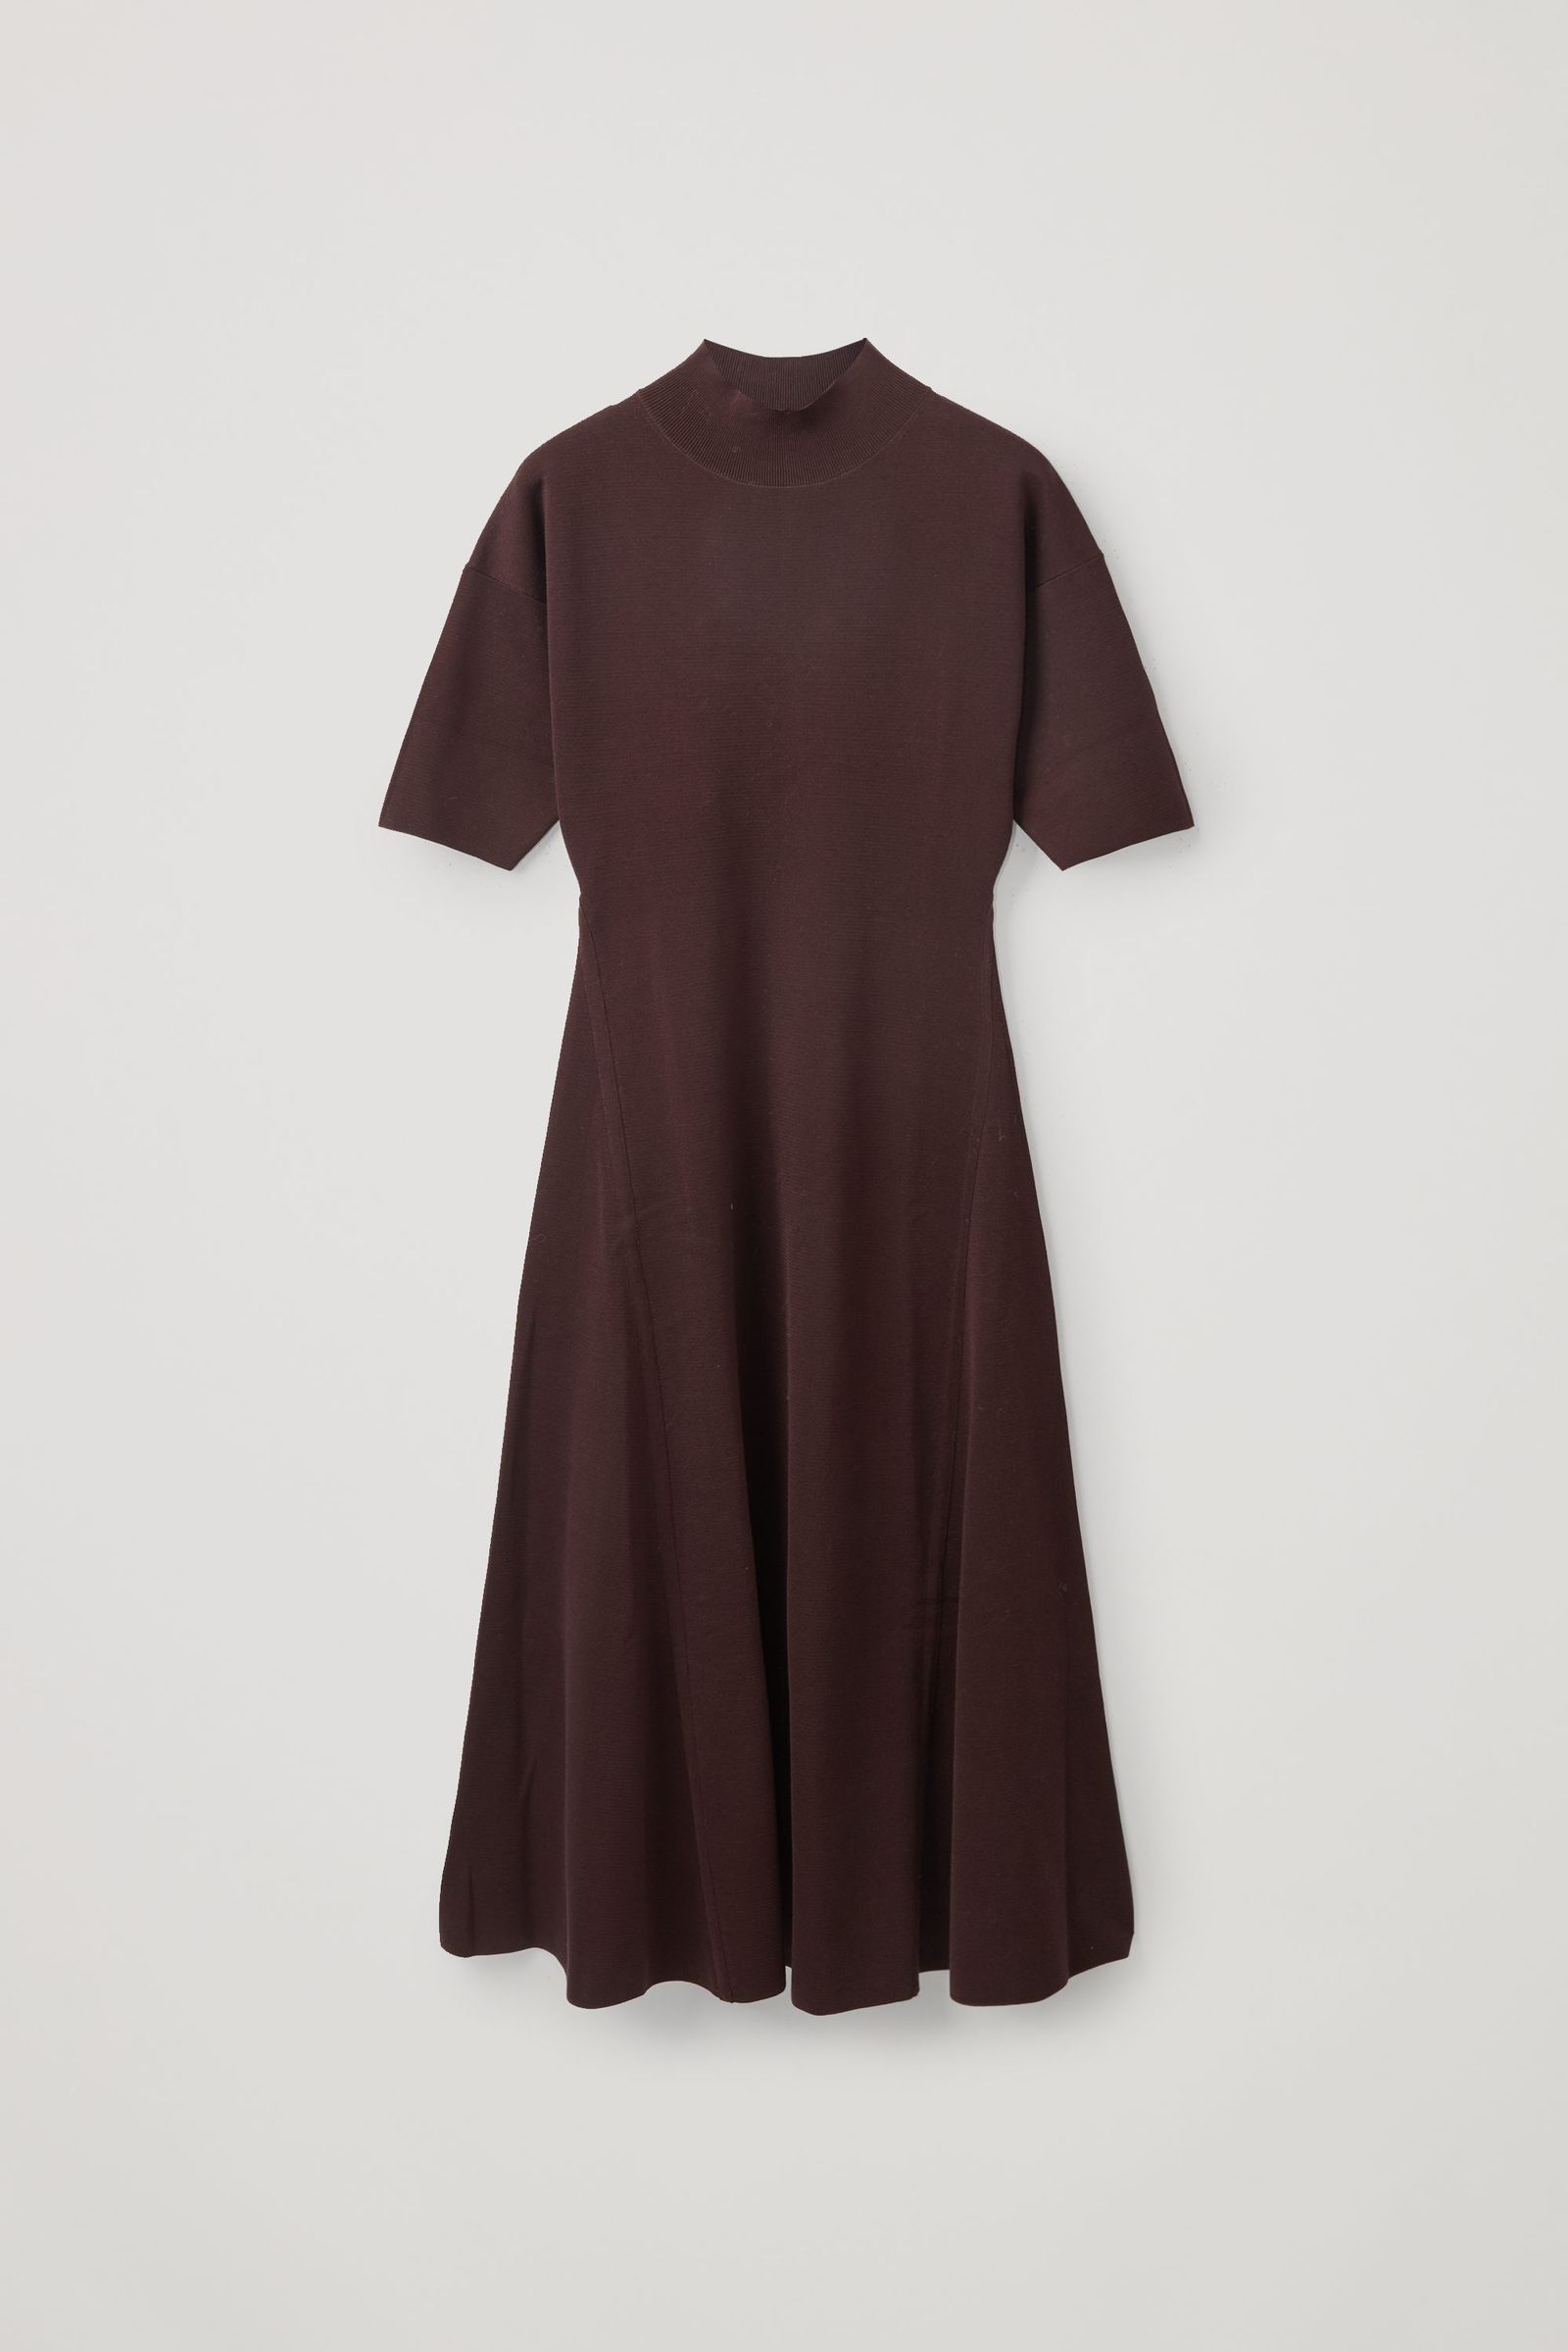 COS 하이넥 니티드 미디 스케이터 드레스의 다크 브라운컬러 Product입니다.